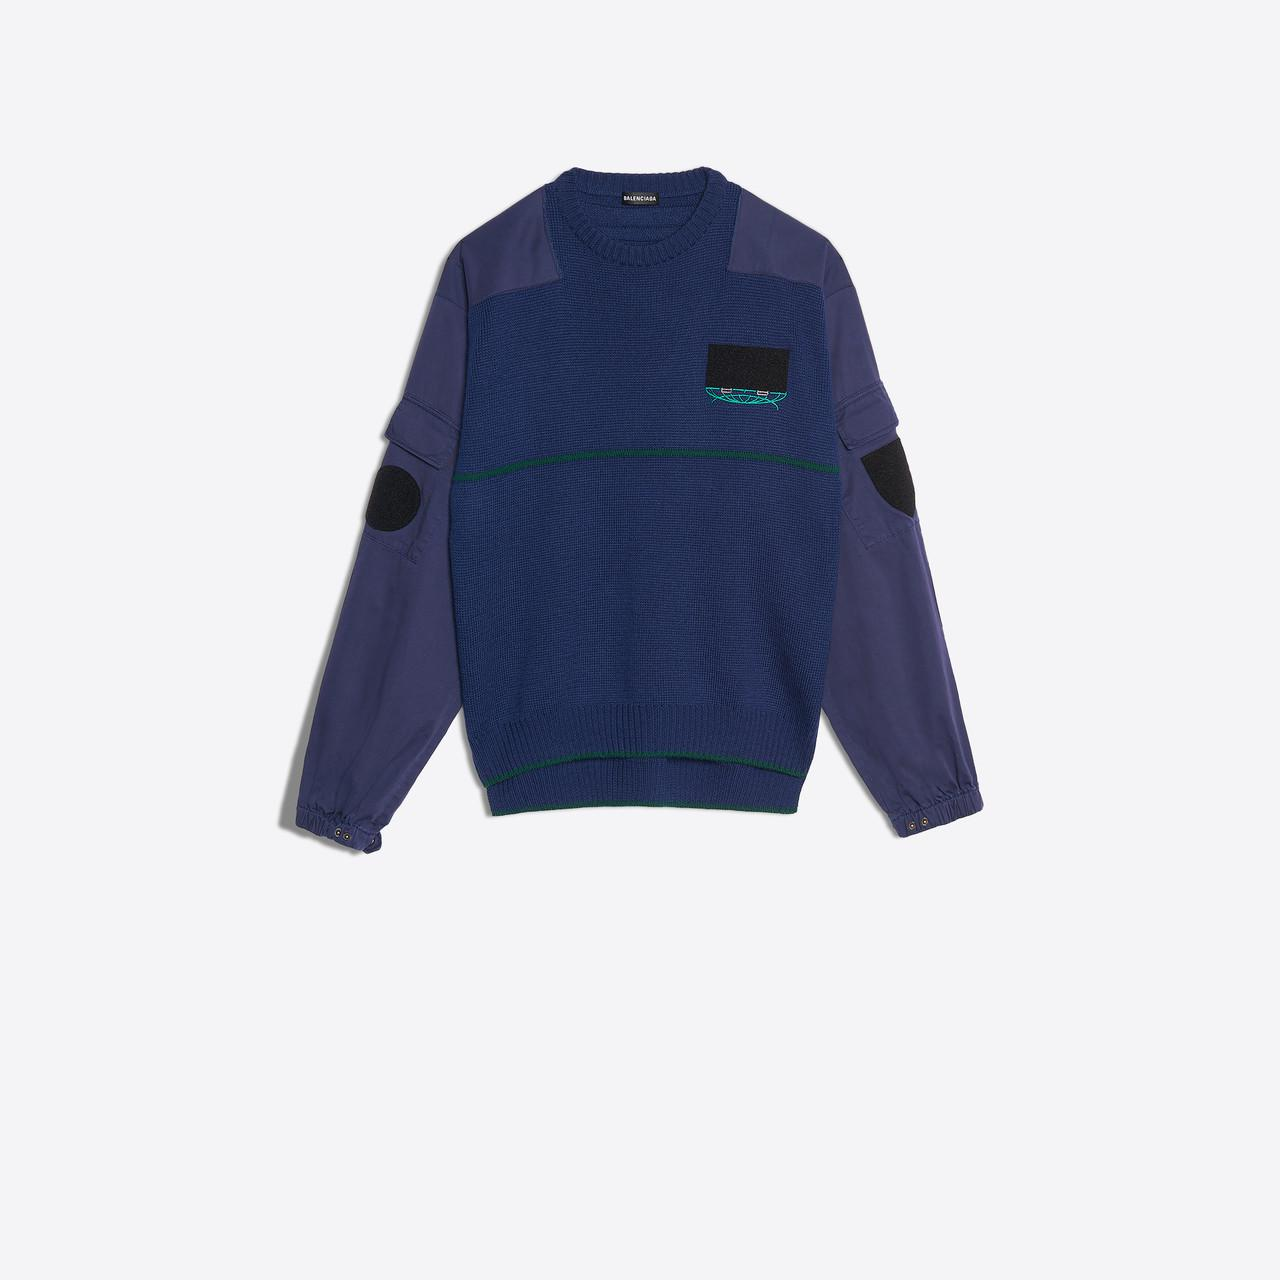 7ce0a0ec Lyst - Balenciaga Patch Crewneck in Blue for Men